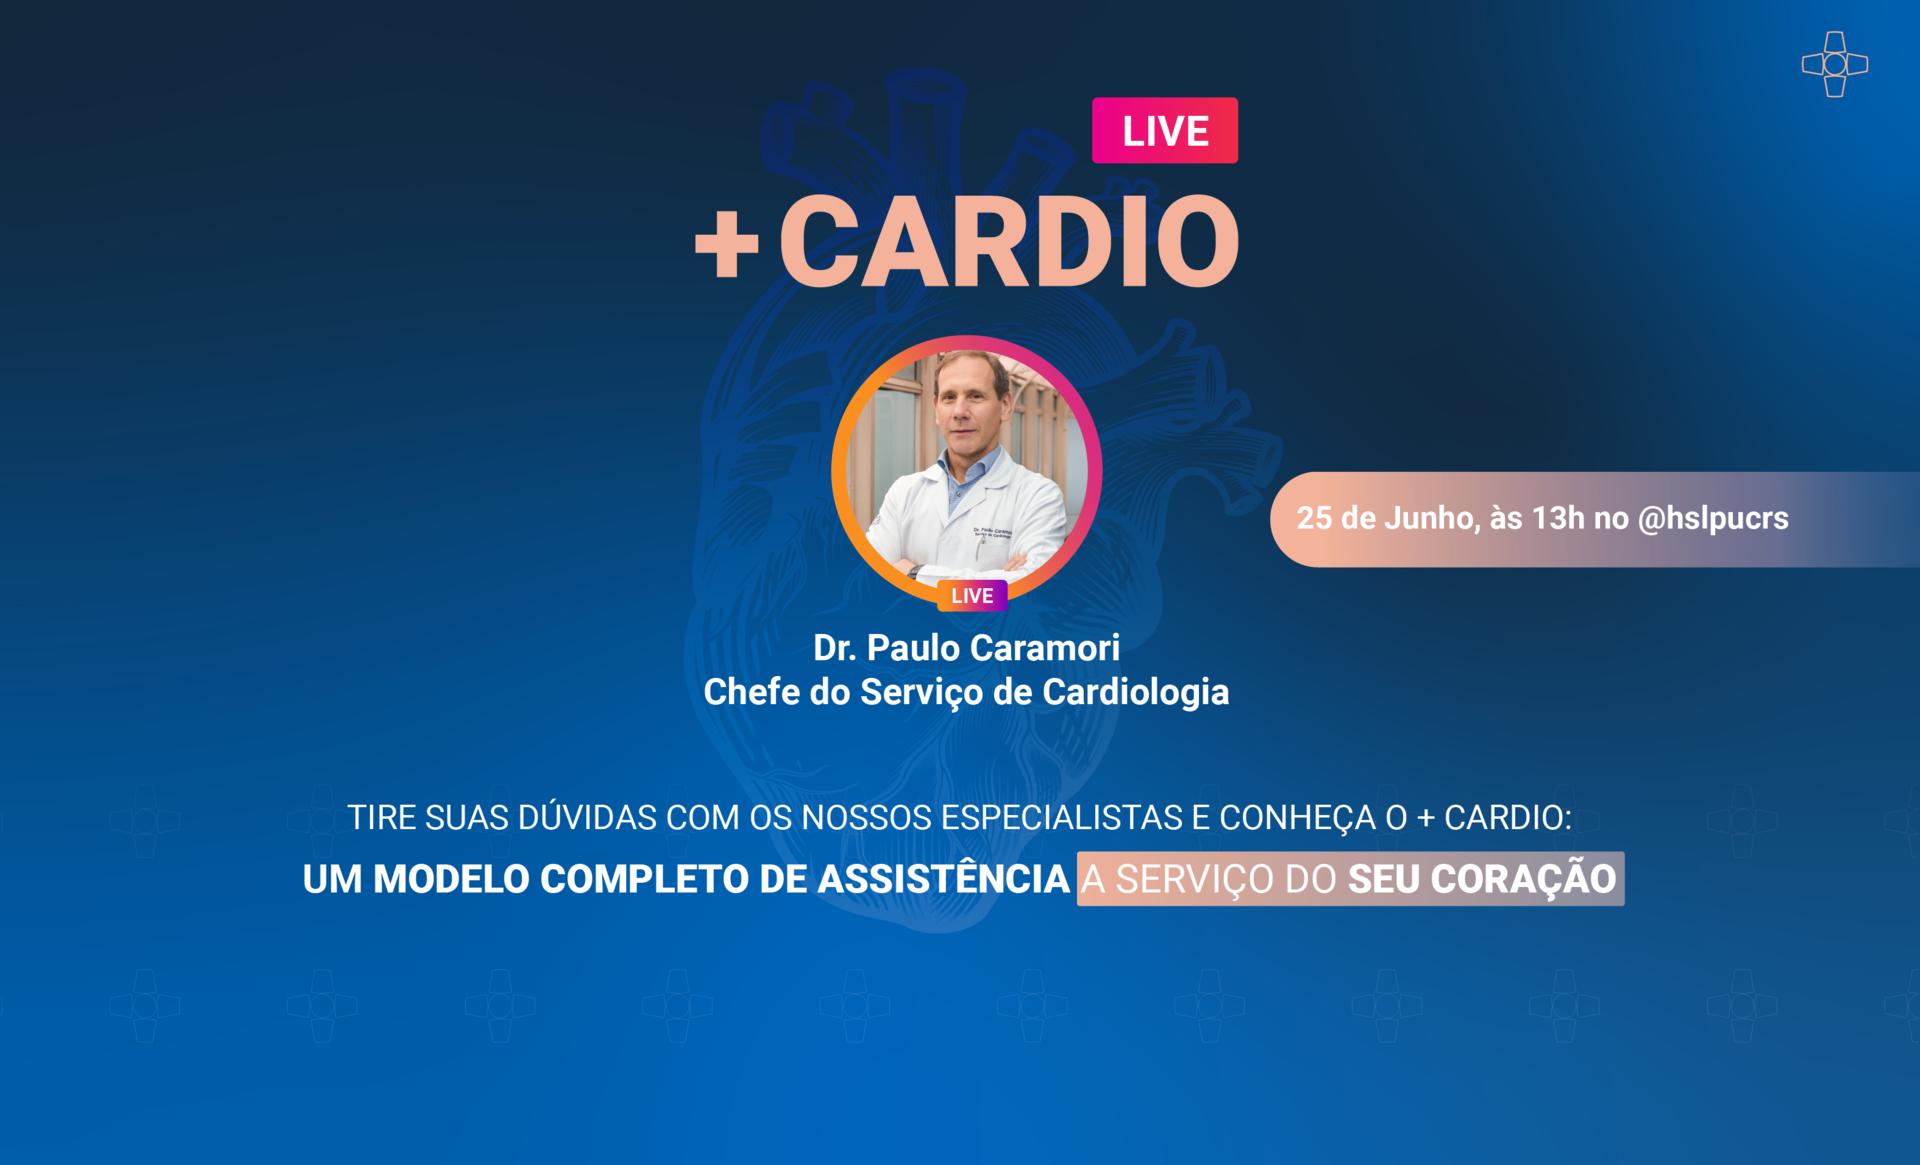 Live + Cardio